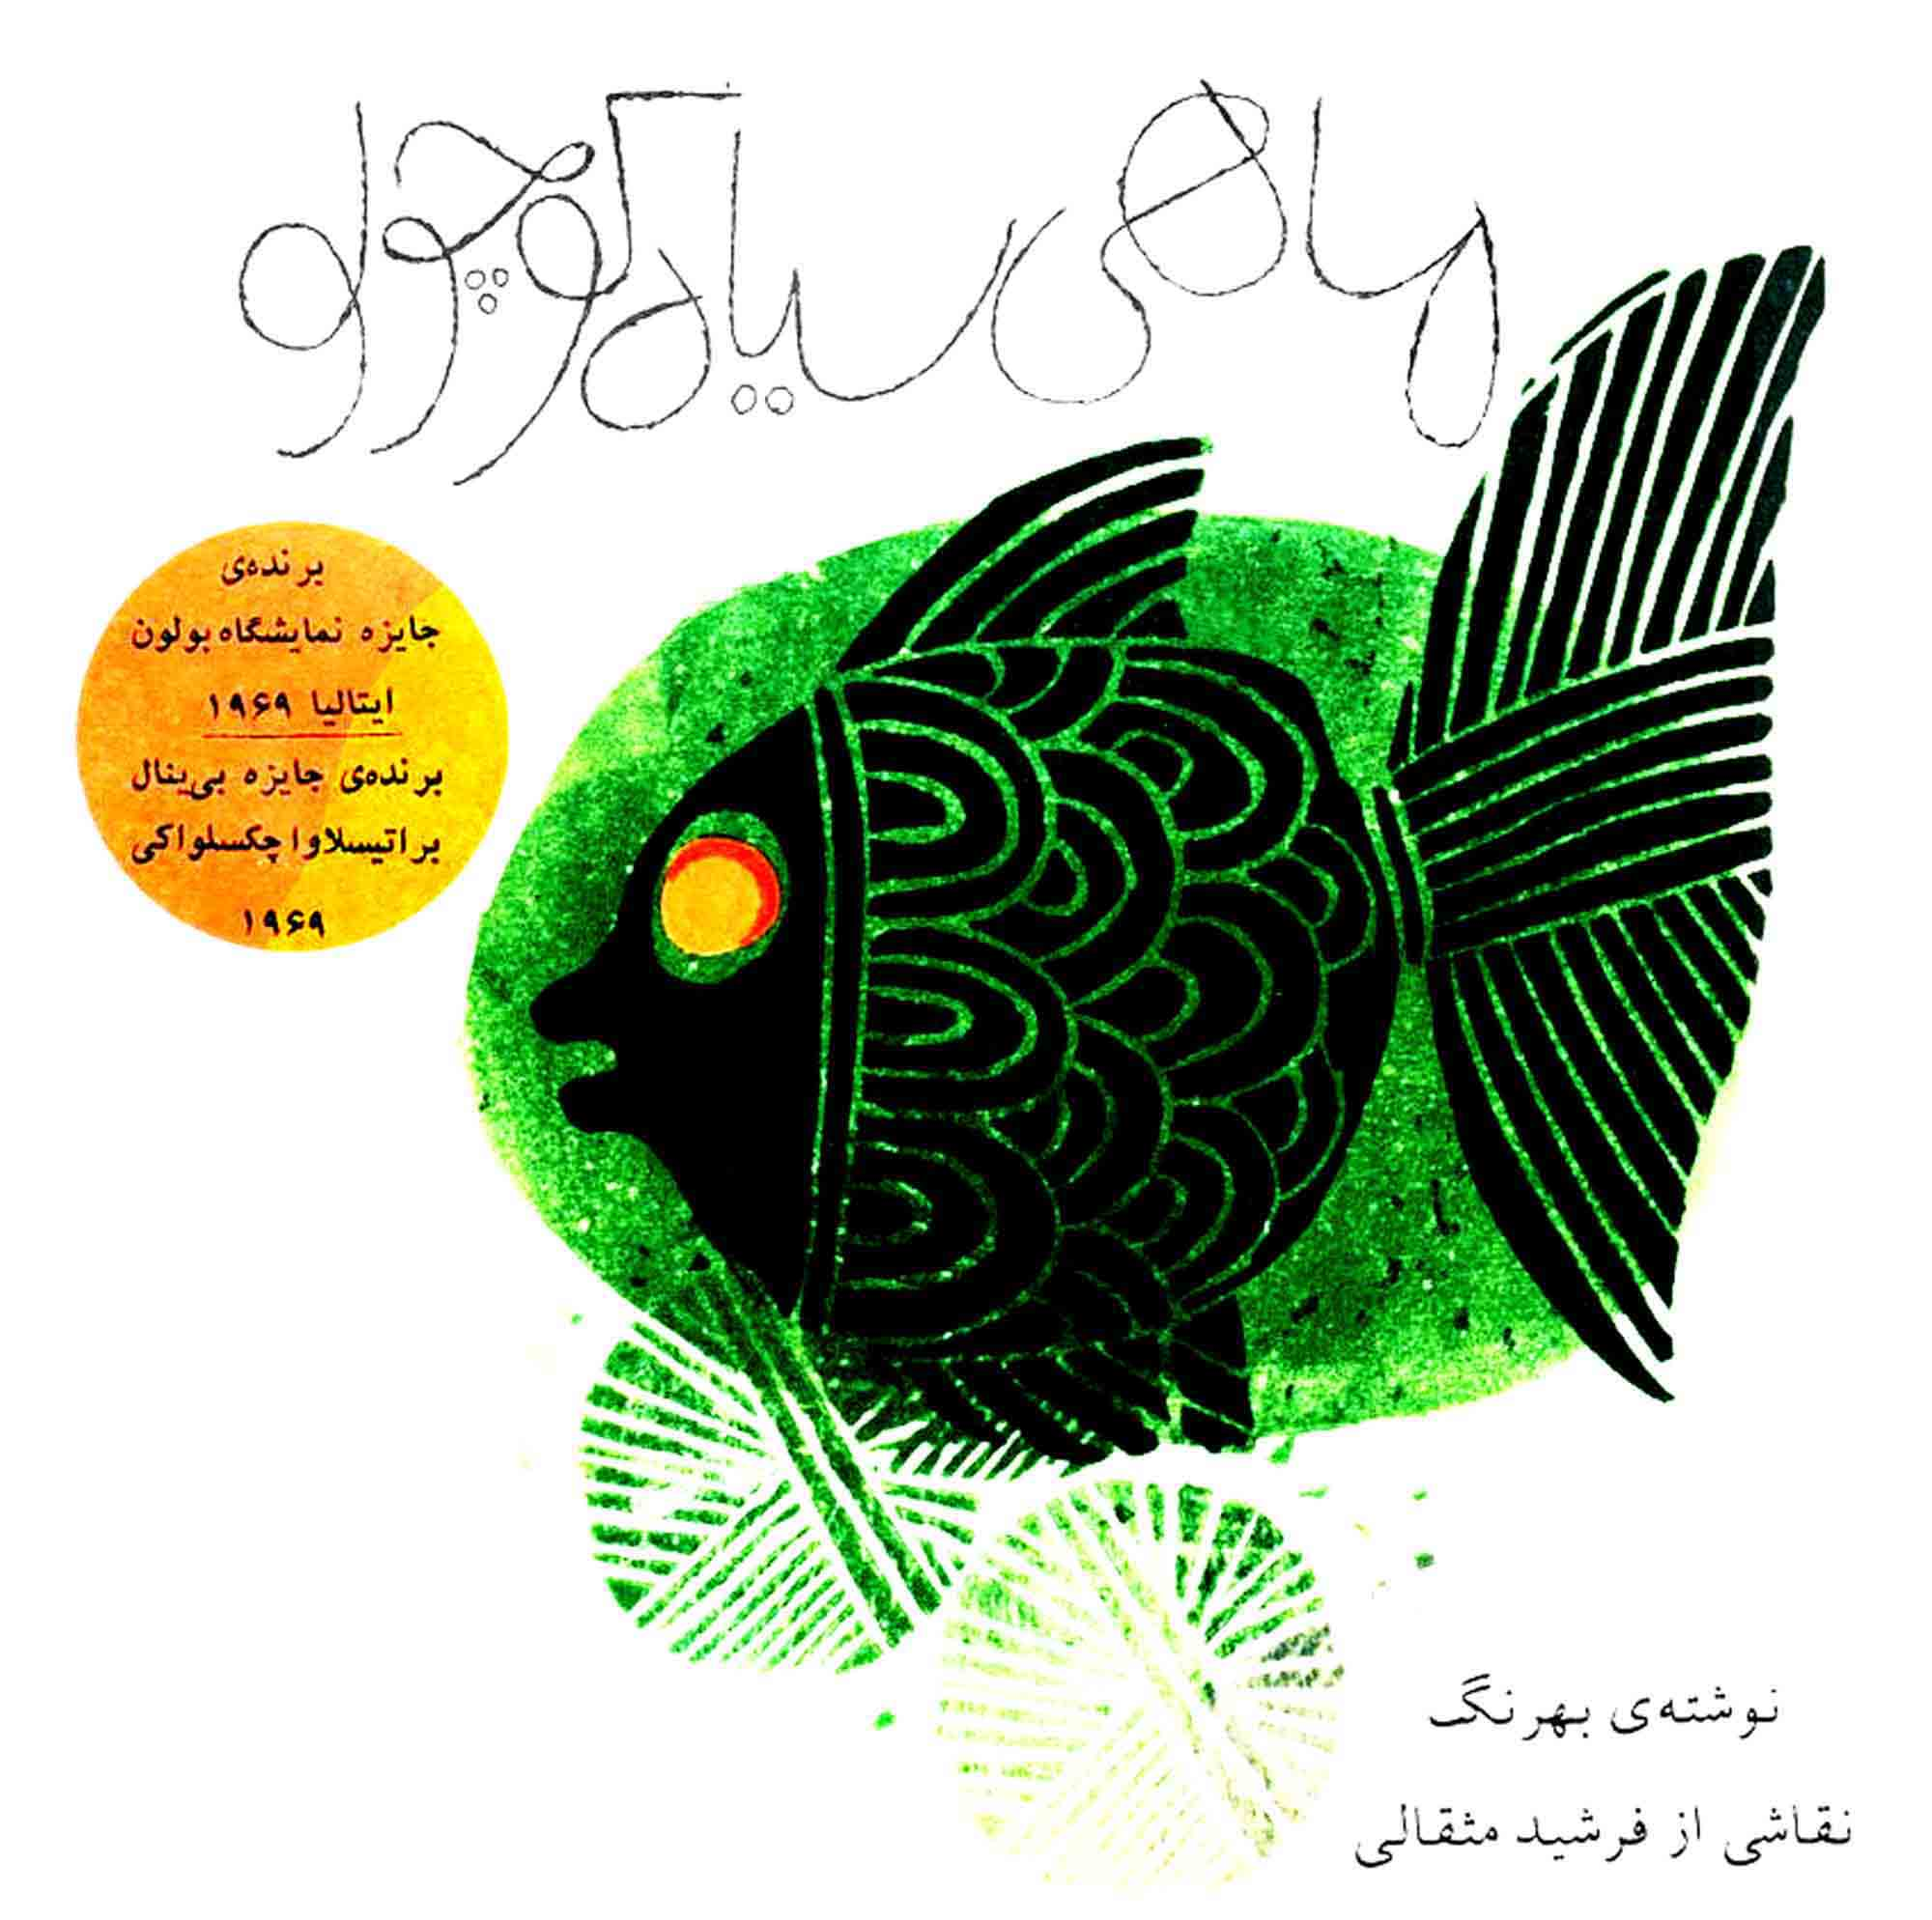 mahi siyahe kouchoulou (the little black fish – original illustrated edition)